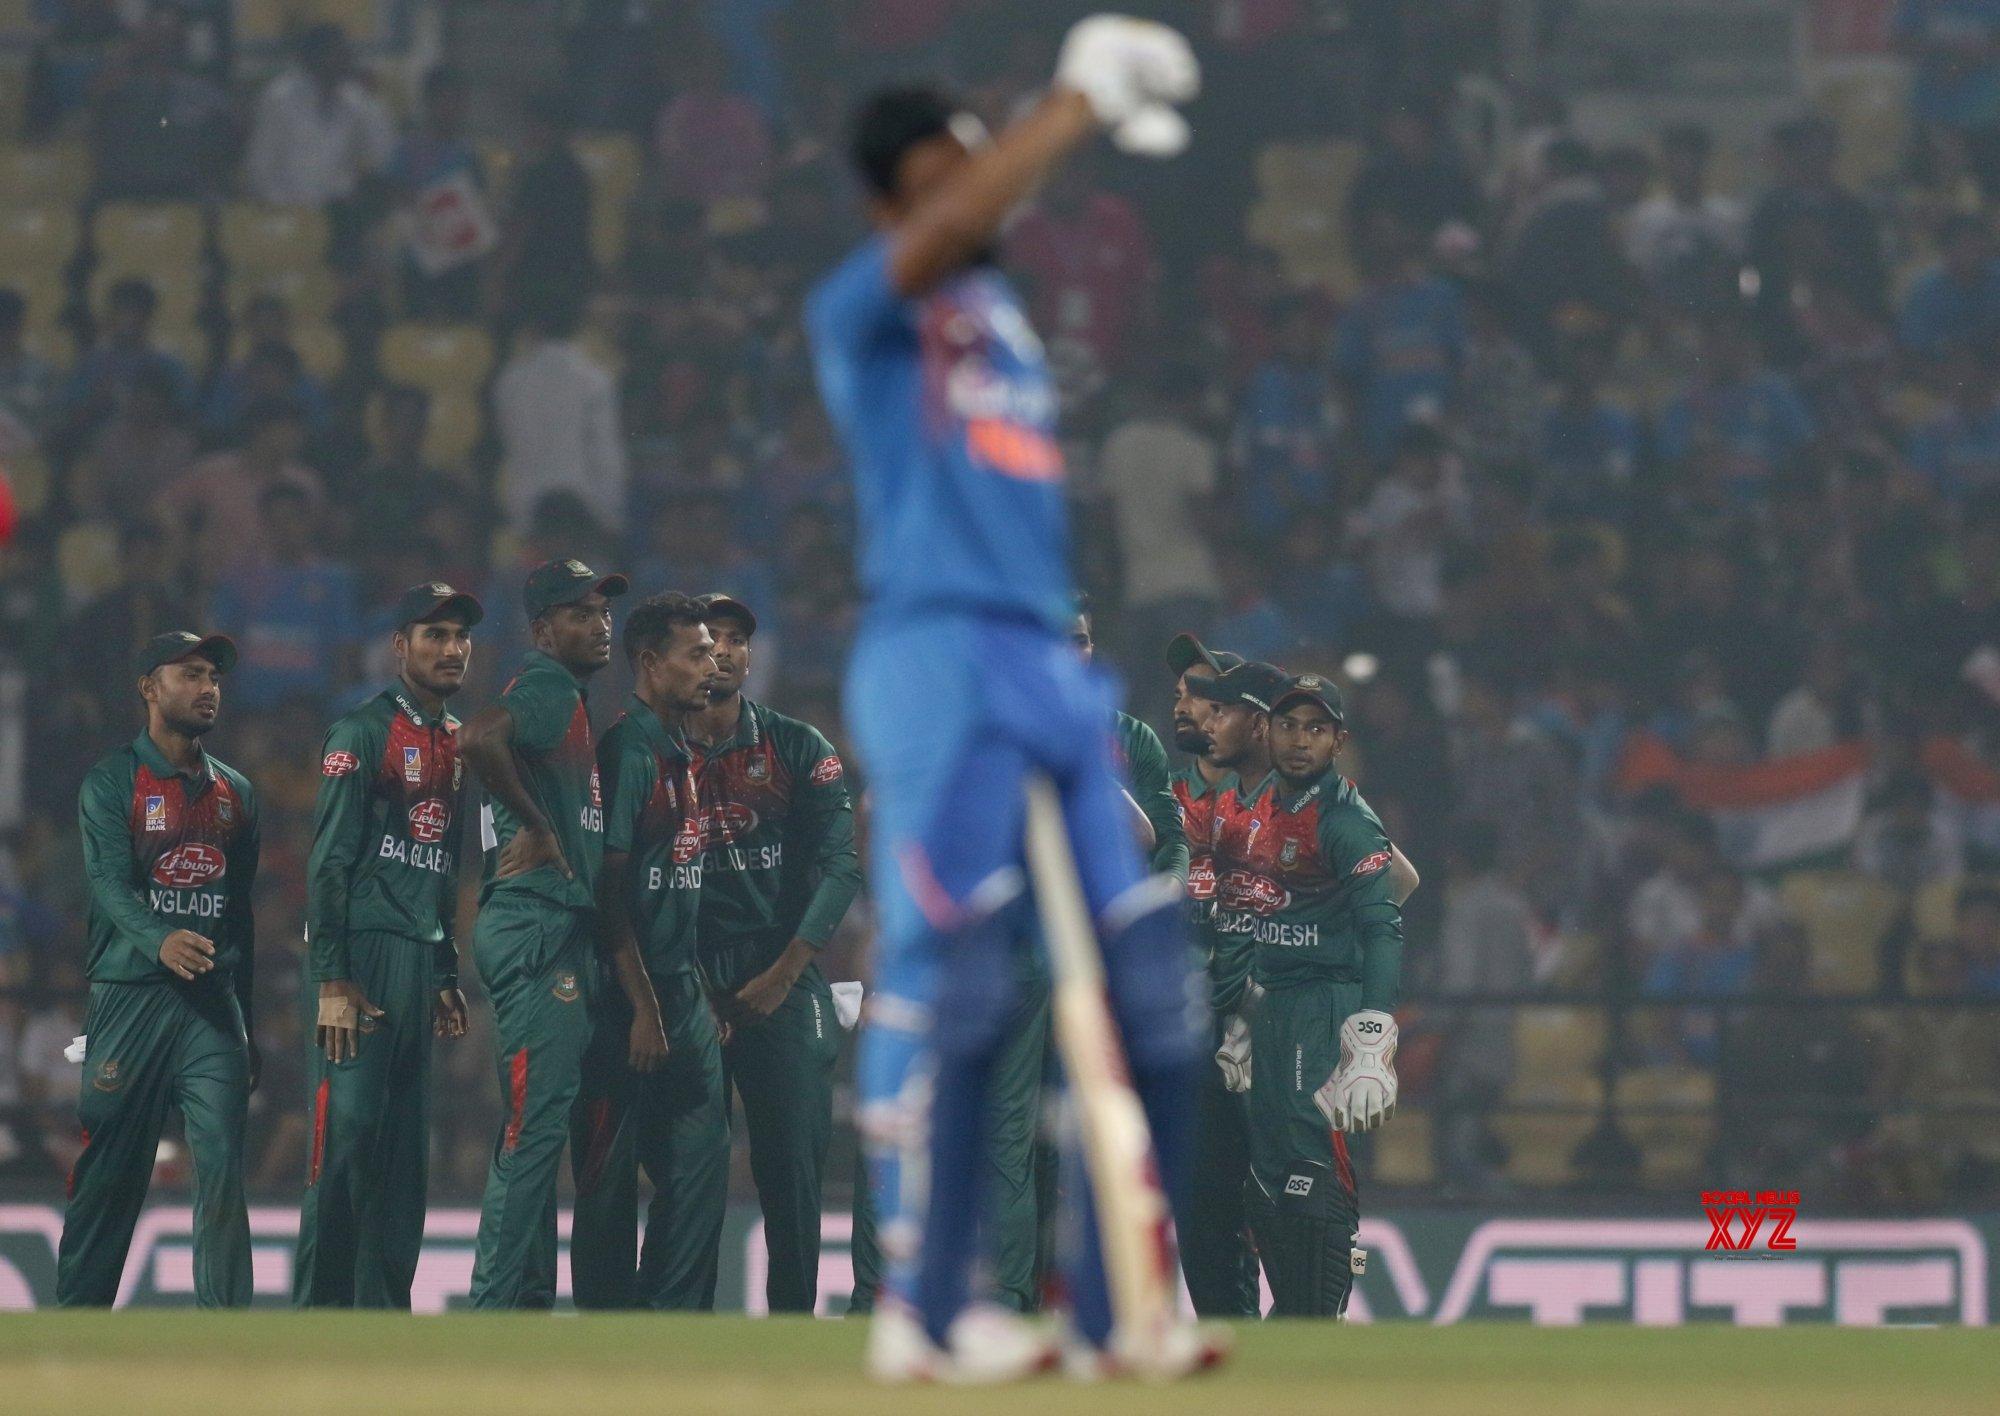 Nagpur: 3rd T20I - India Vs Bangladesh (Batch - 4) #Gallery